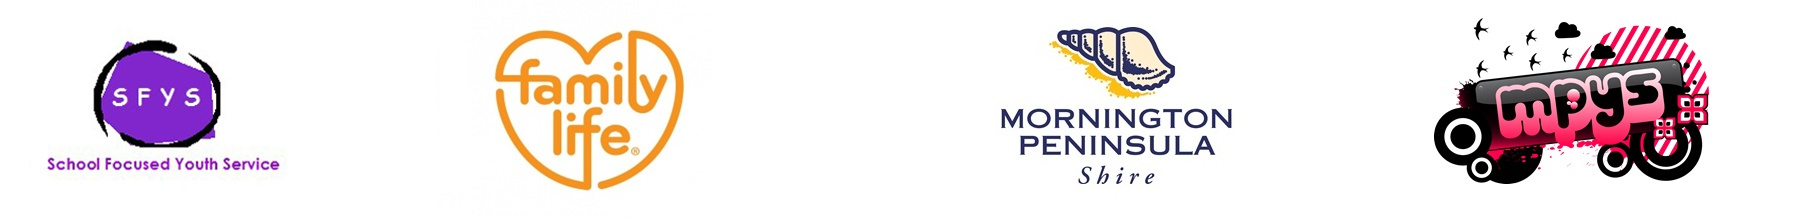 mornington peninsula shire branding guidelines